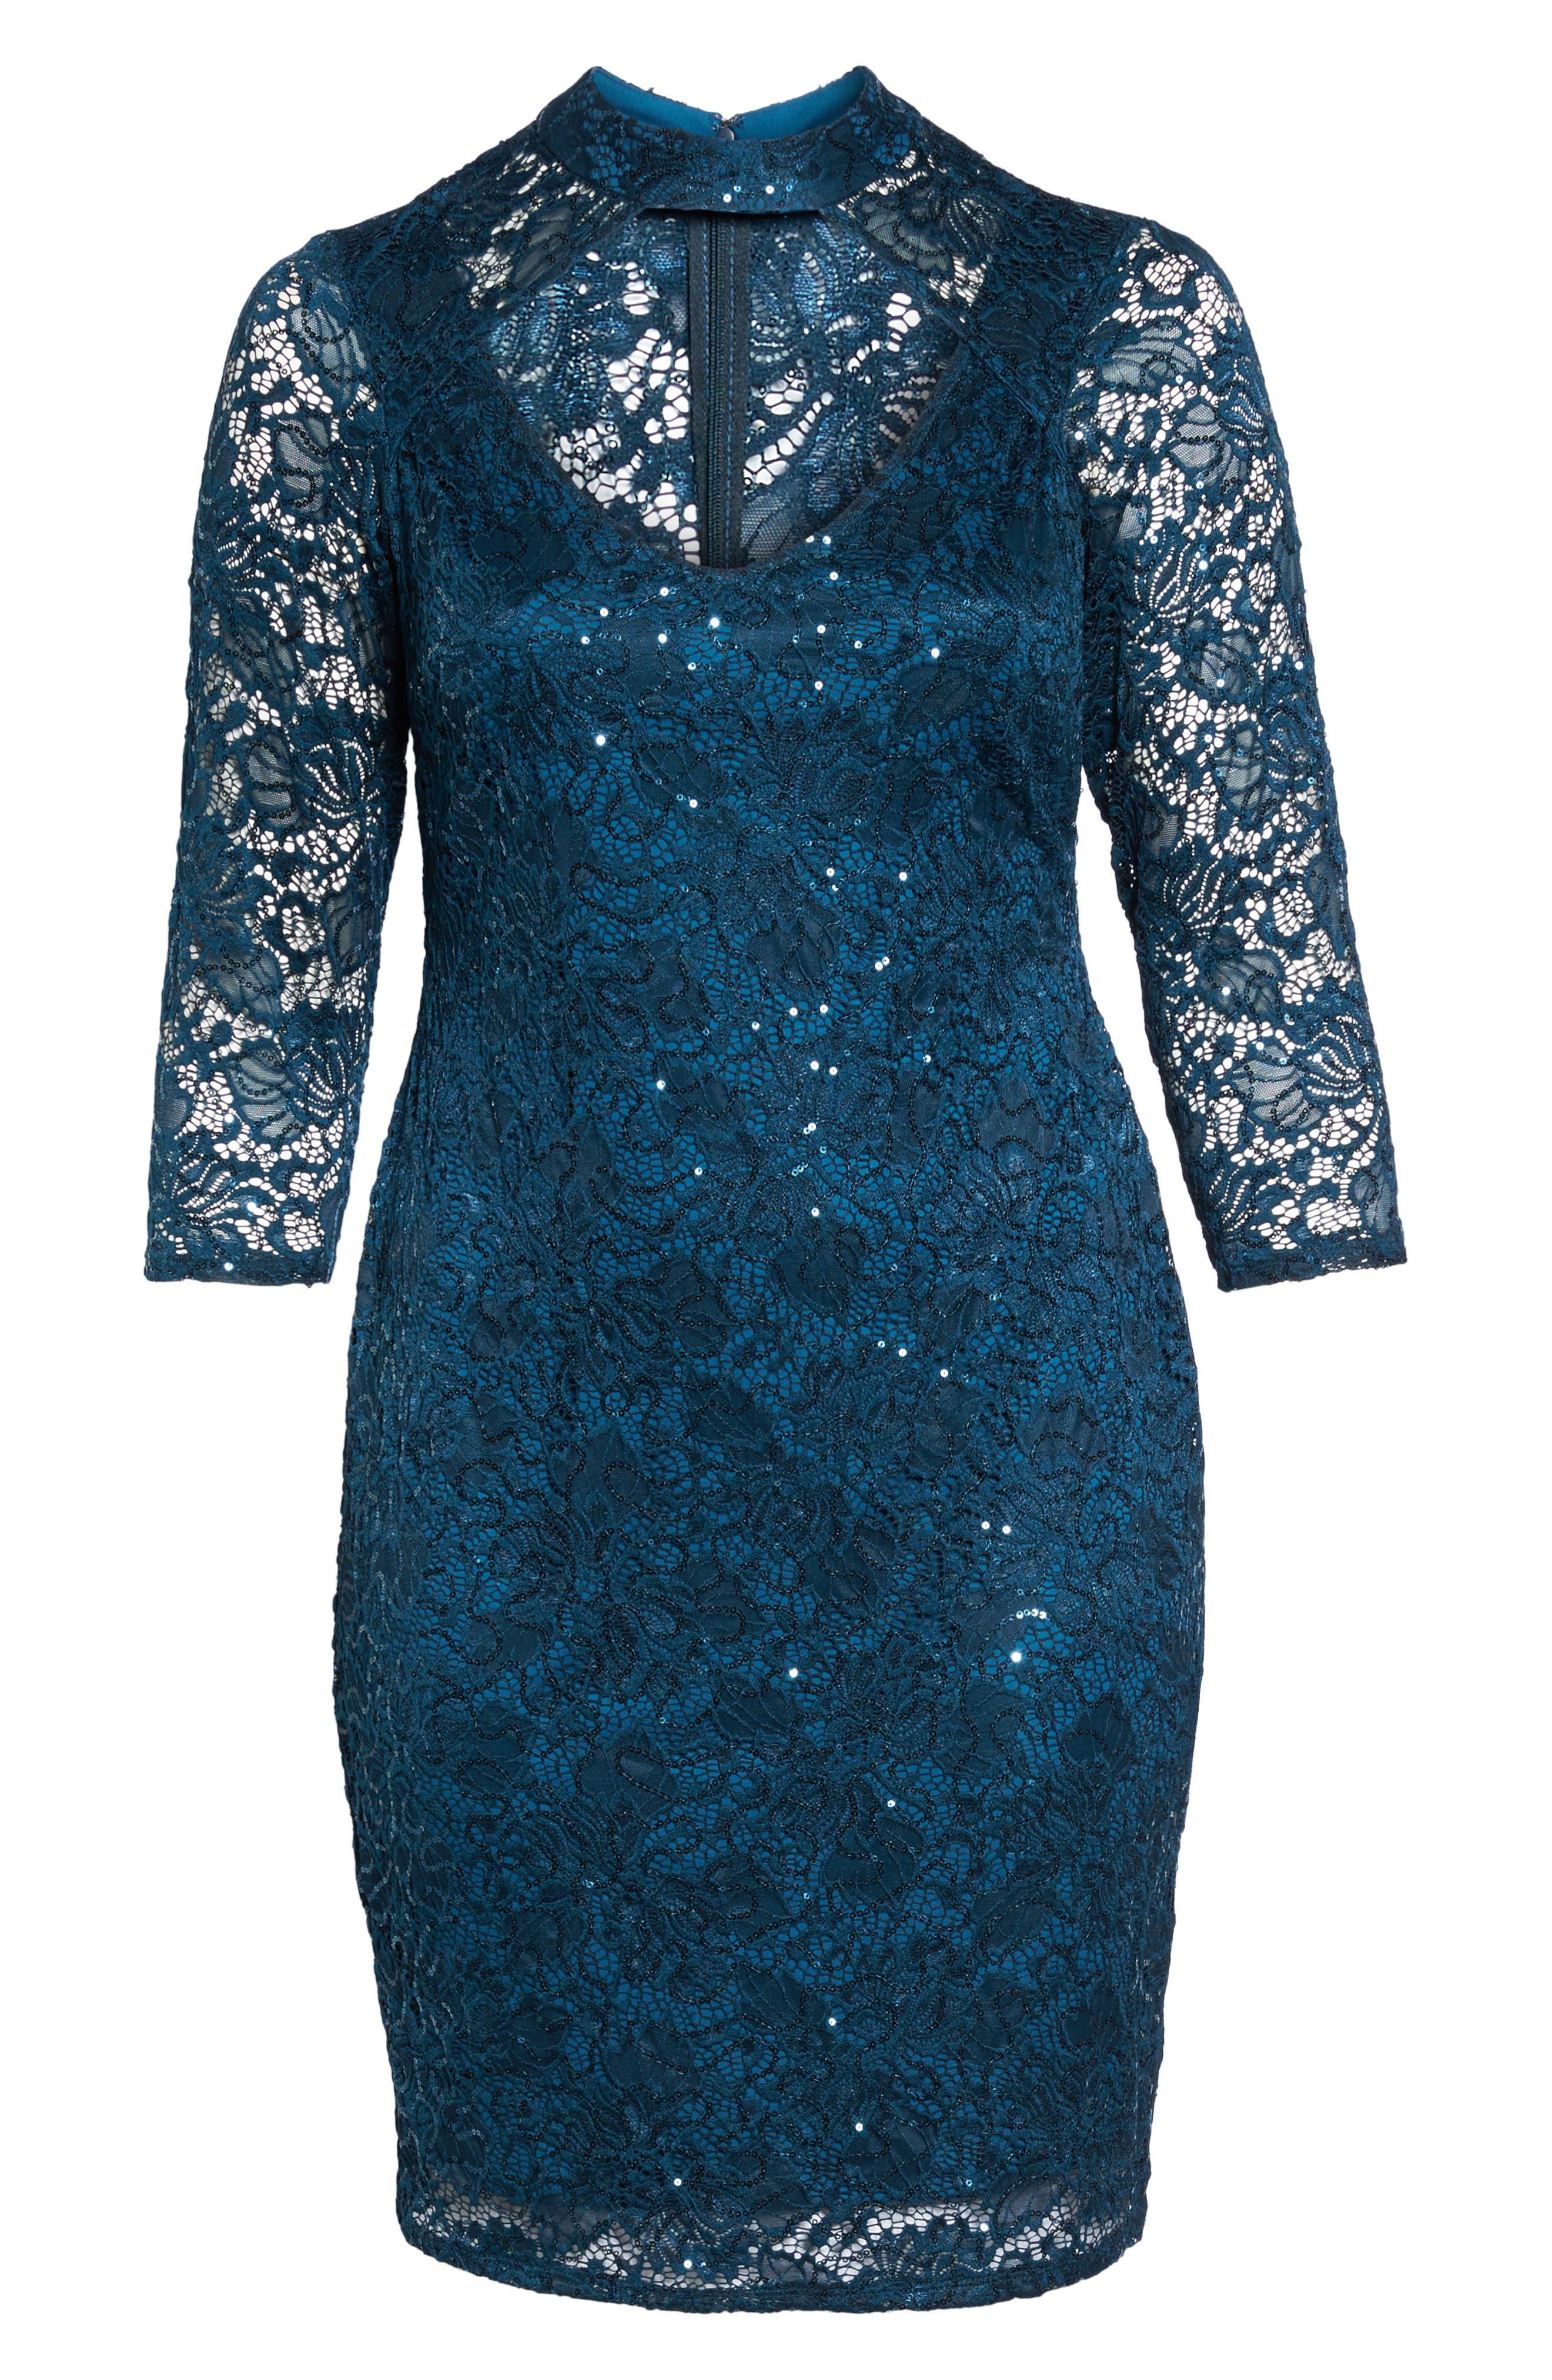 Choker Neck Lace Sheath Dress,                             Alternate thumbnail 6, color,                             300